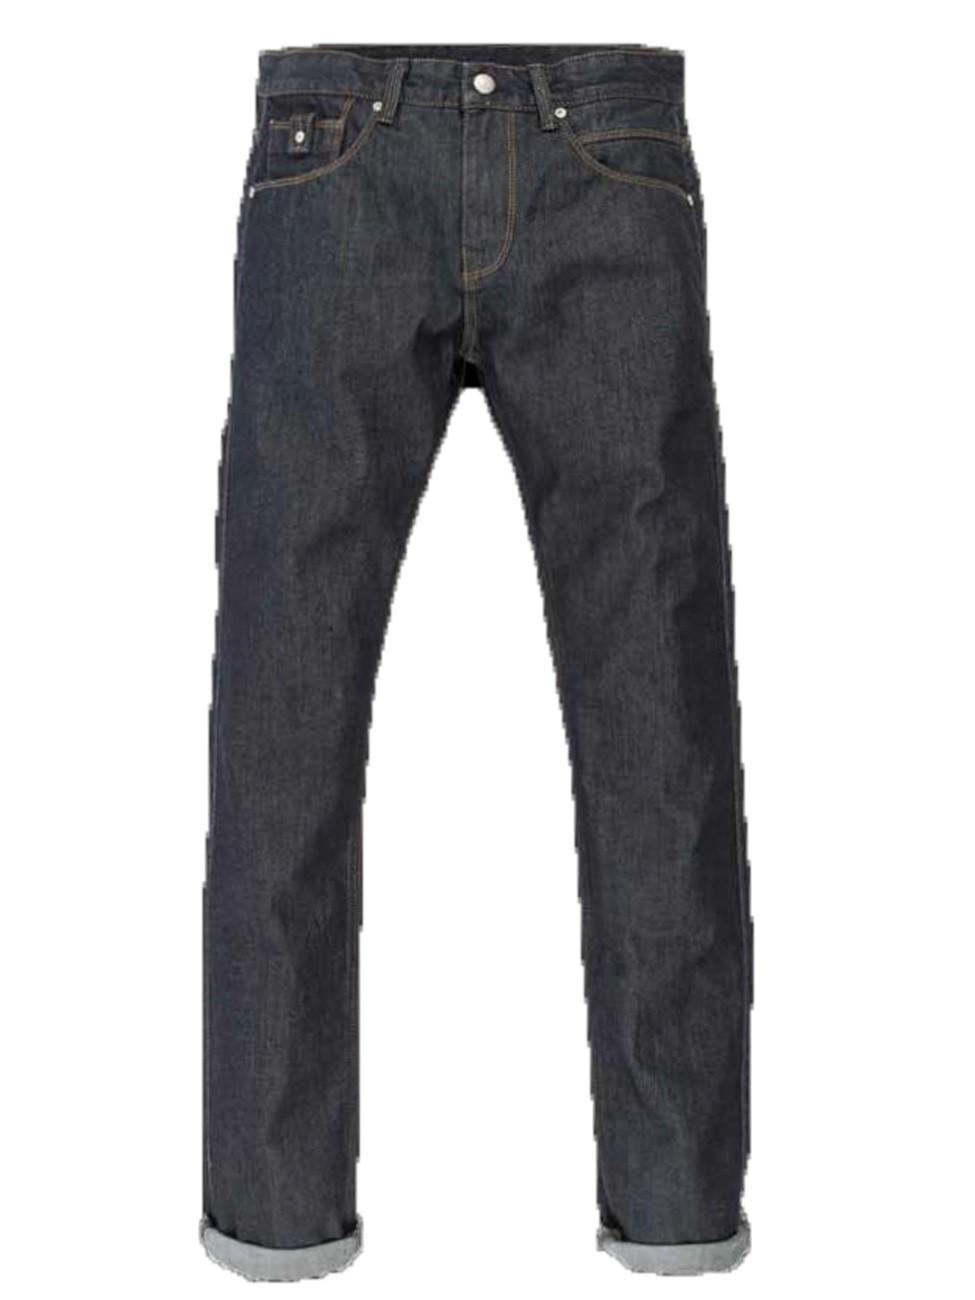 ltb herren jeans joshua x slim fit blue waterless wash ebay. Black Bedroom Furniture Sets. Home Design Ideas